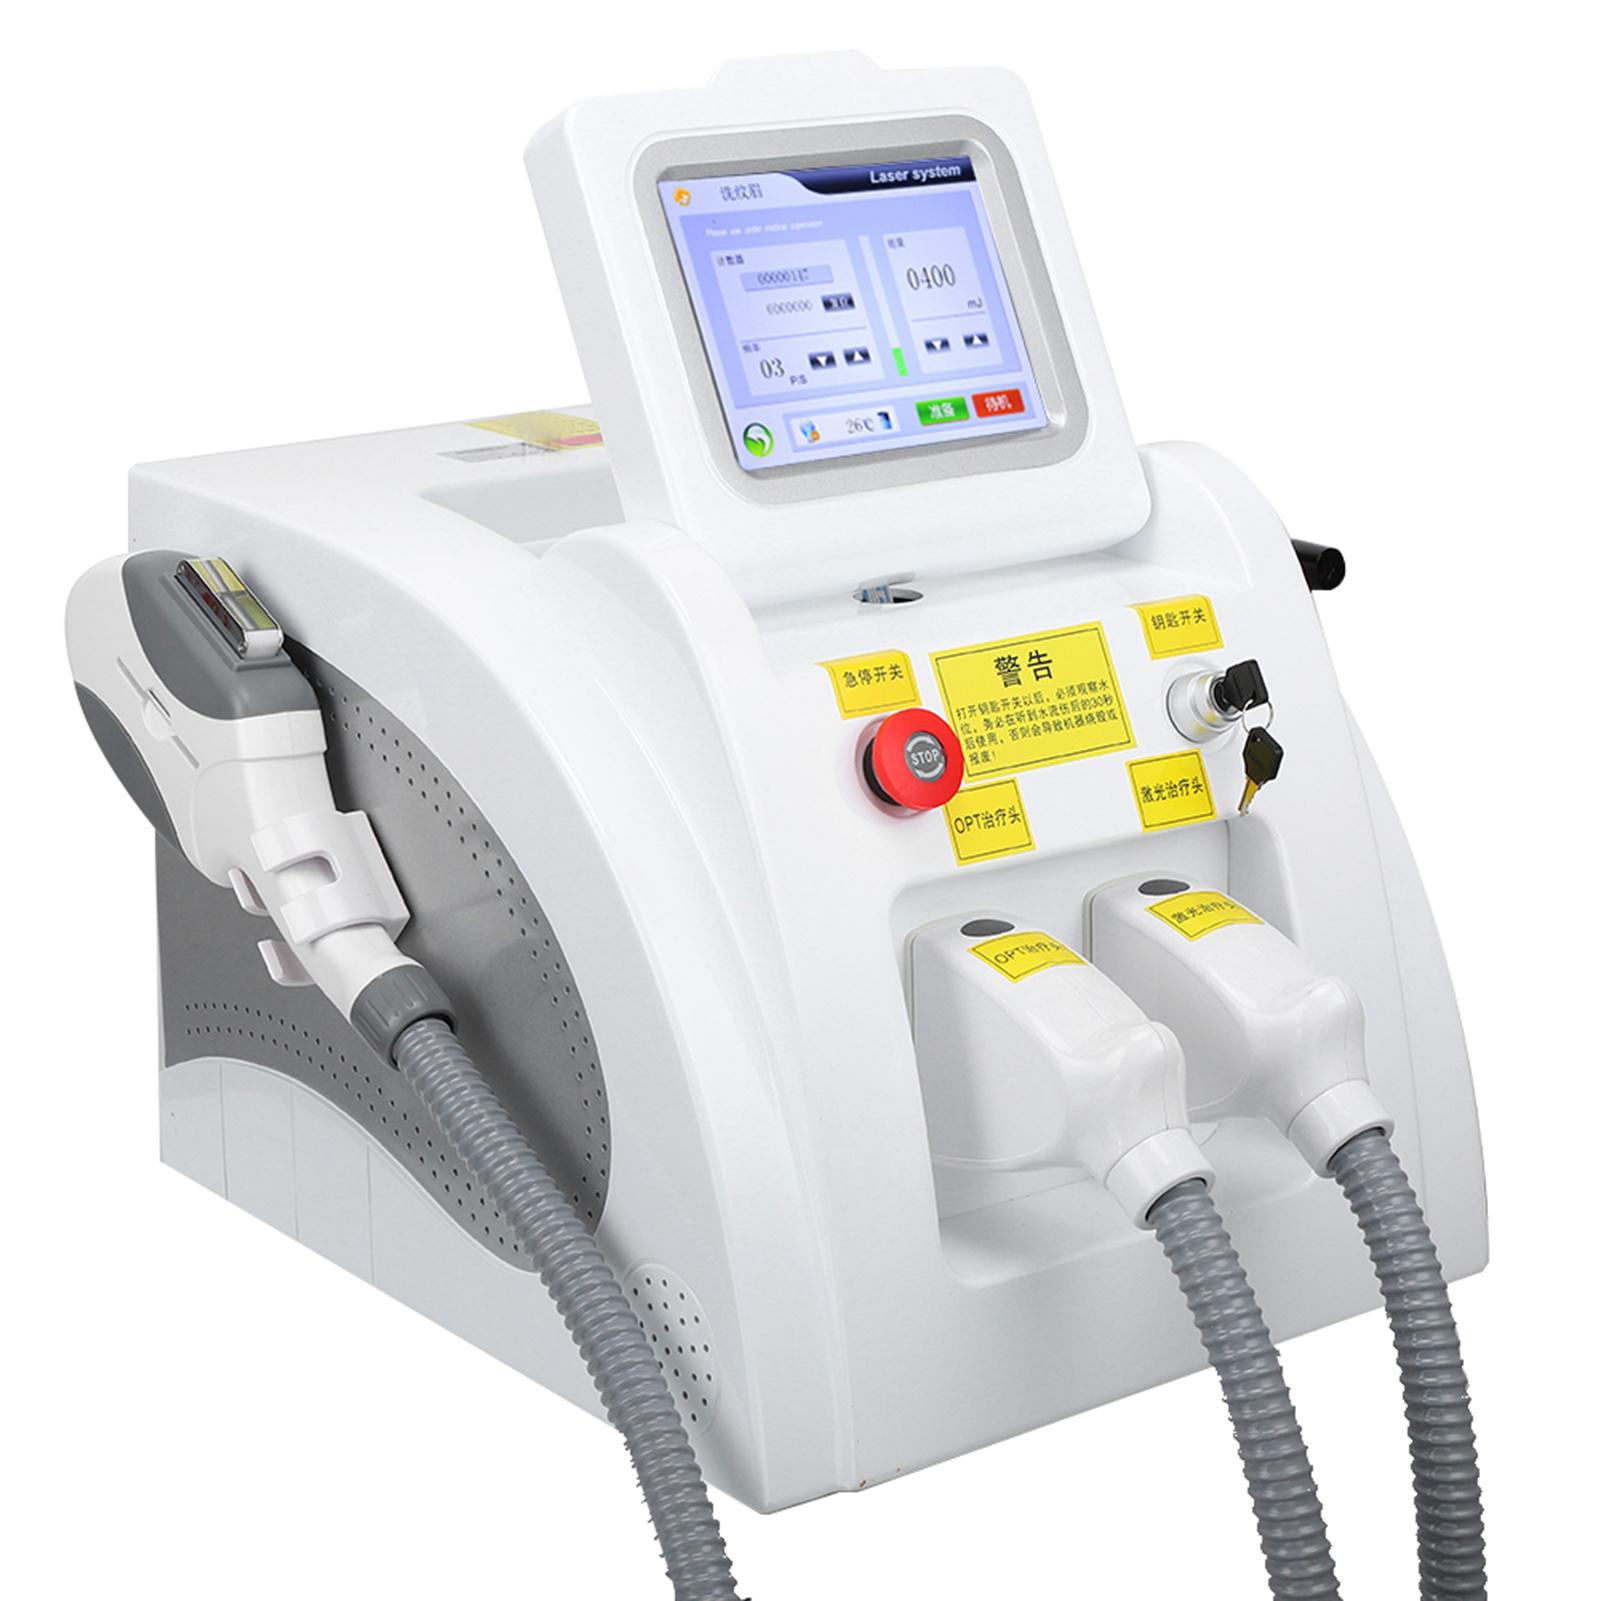 Indexbild 15 - 2In1 SHR OPT IPL Hair Removal RF Laser Skin Rejuvenation Tattoo Removal Machine